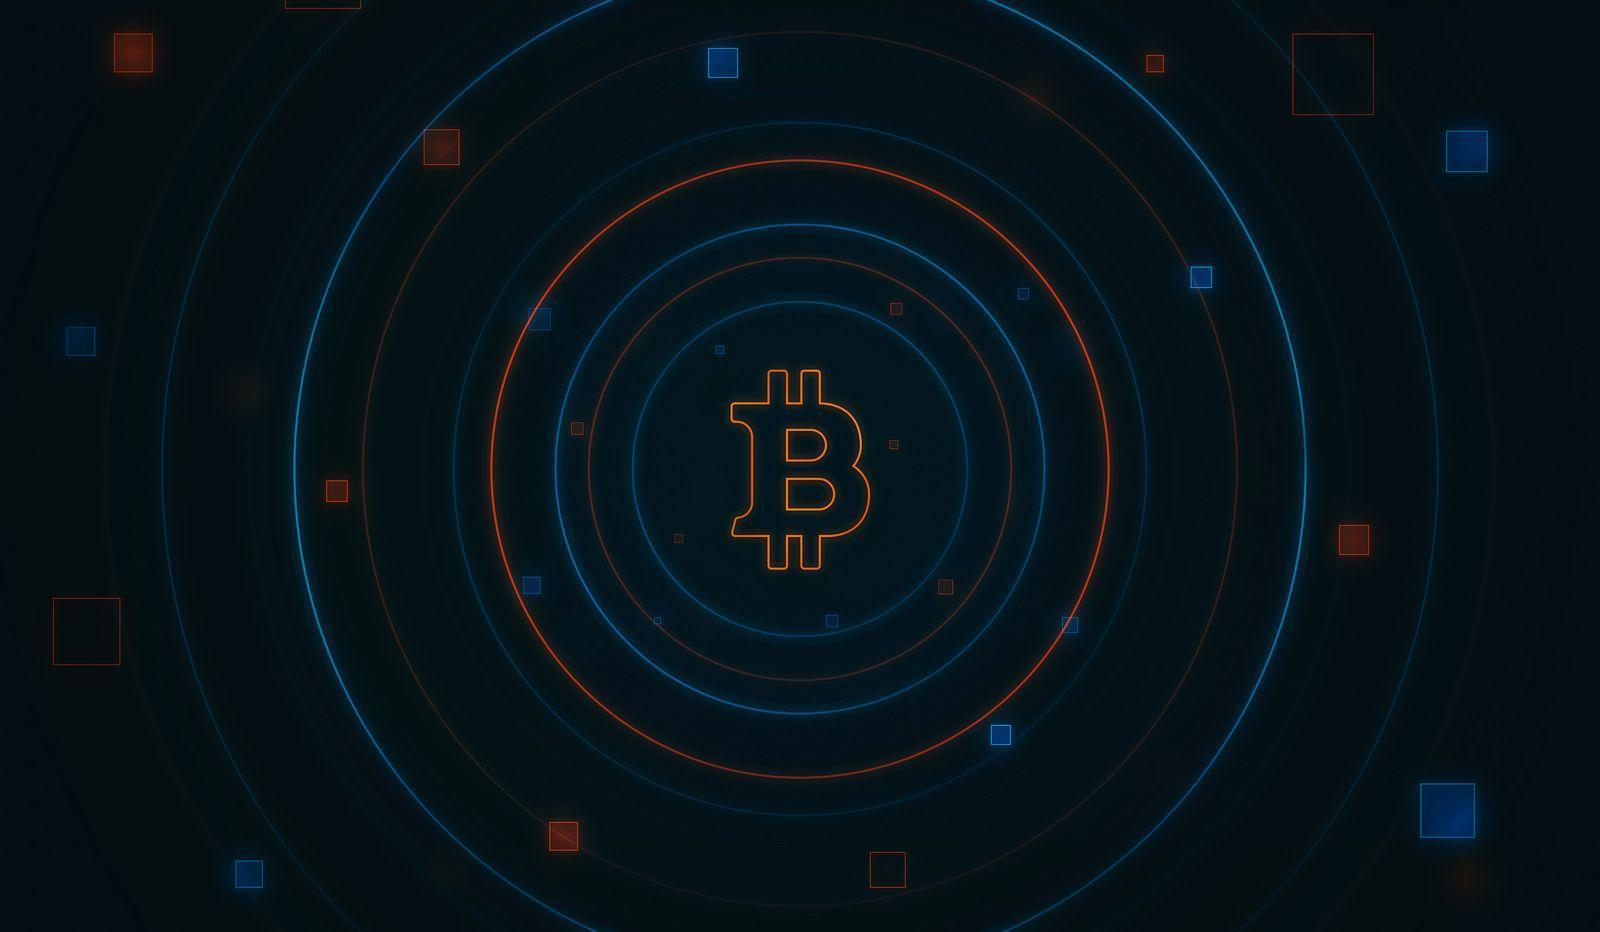 Bitcoin Wallpapers Wallpaper Cave